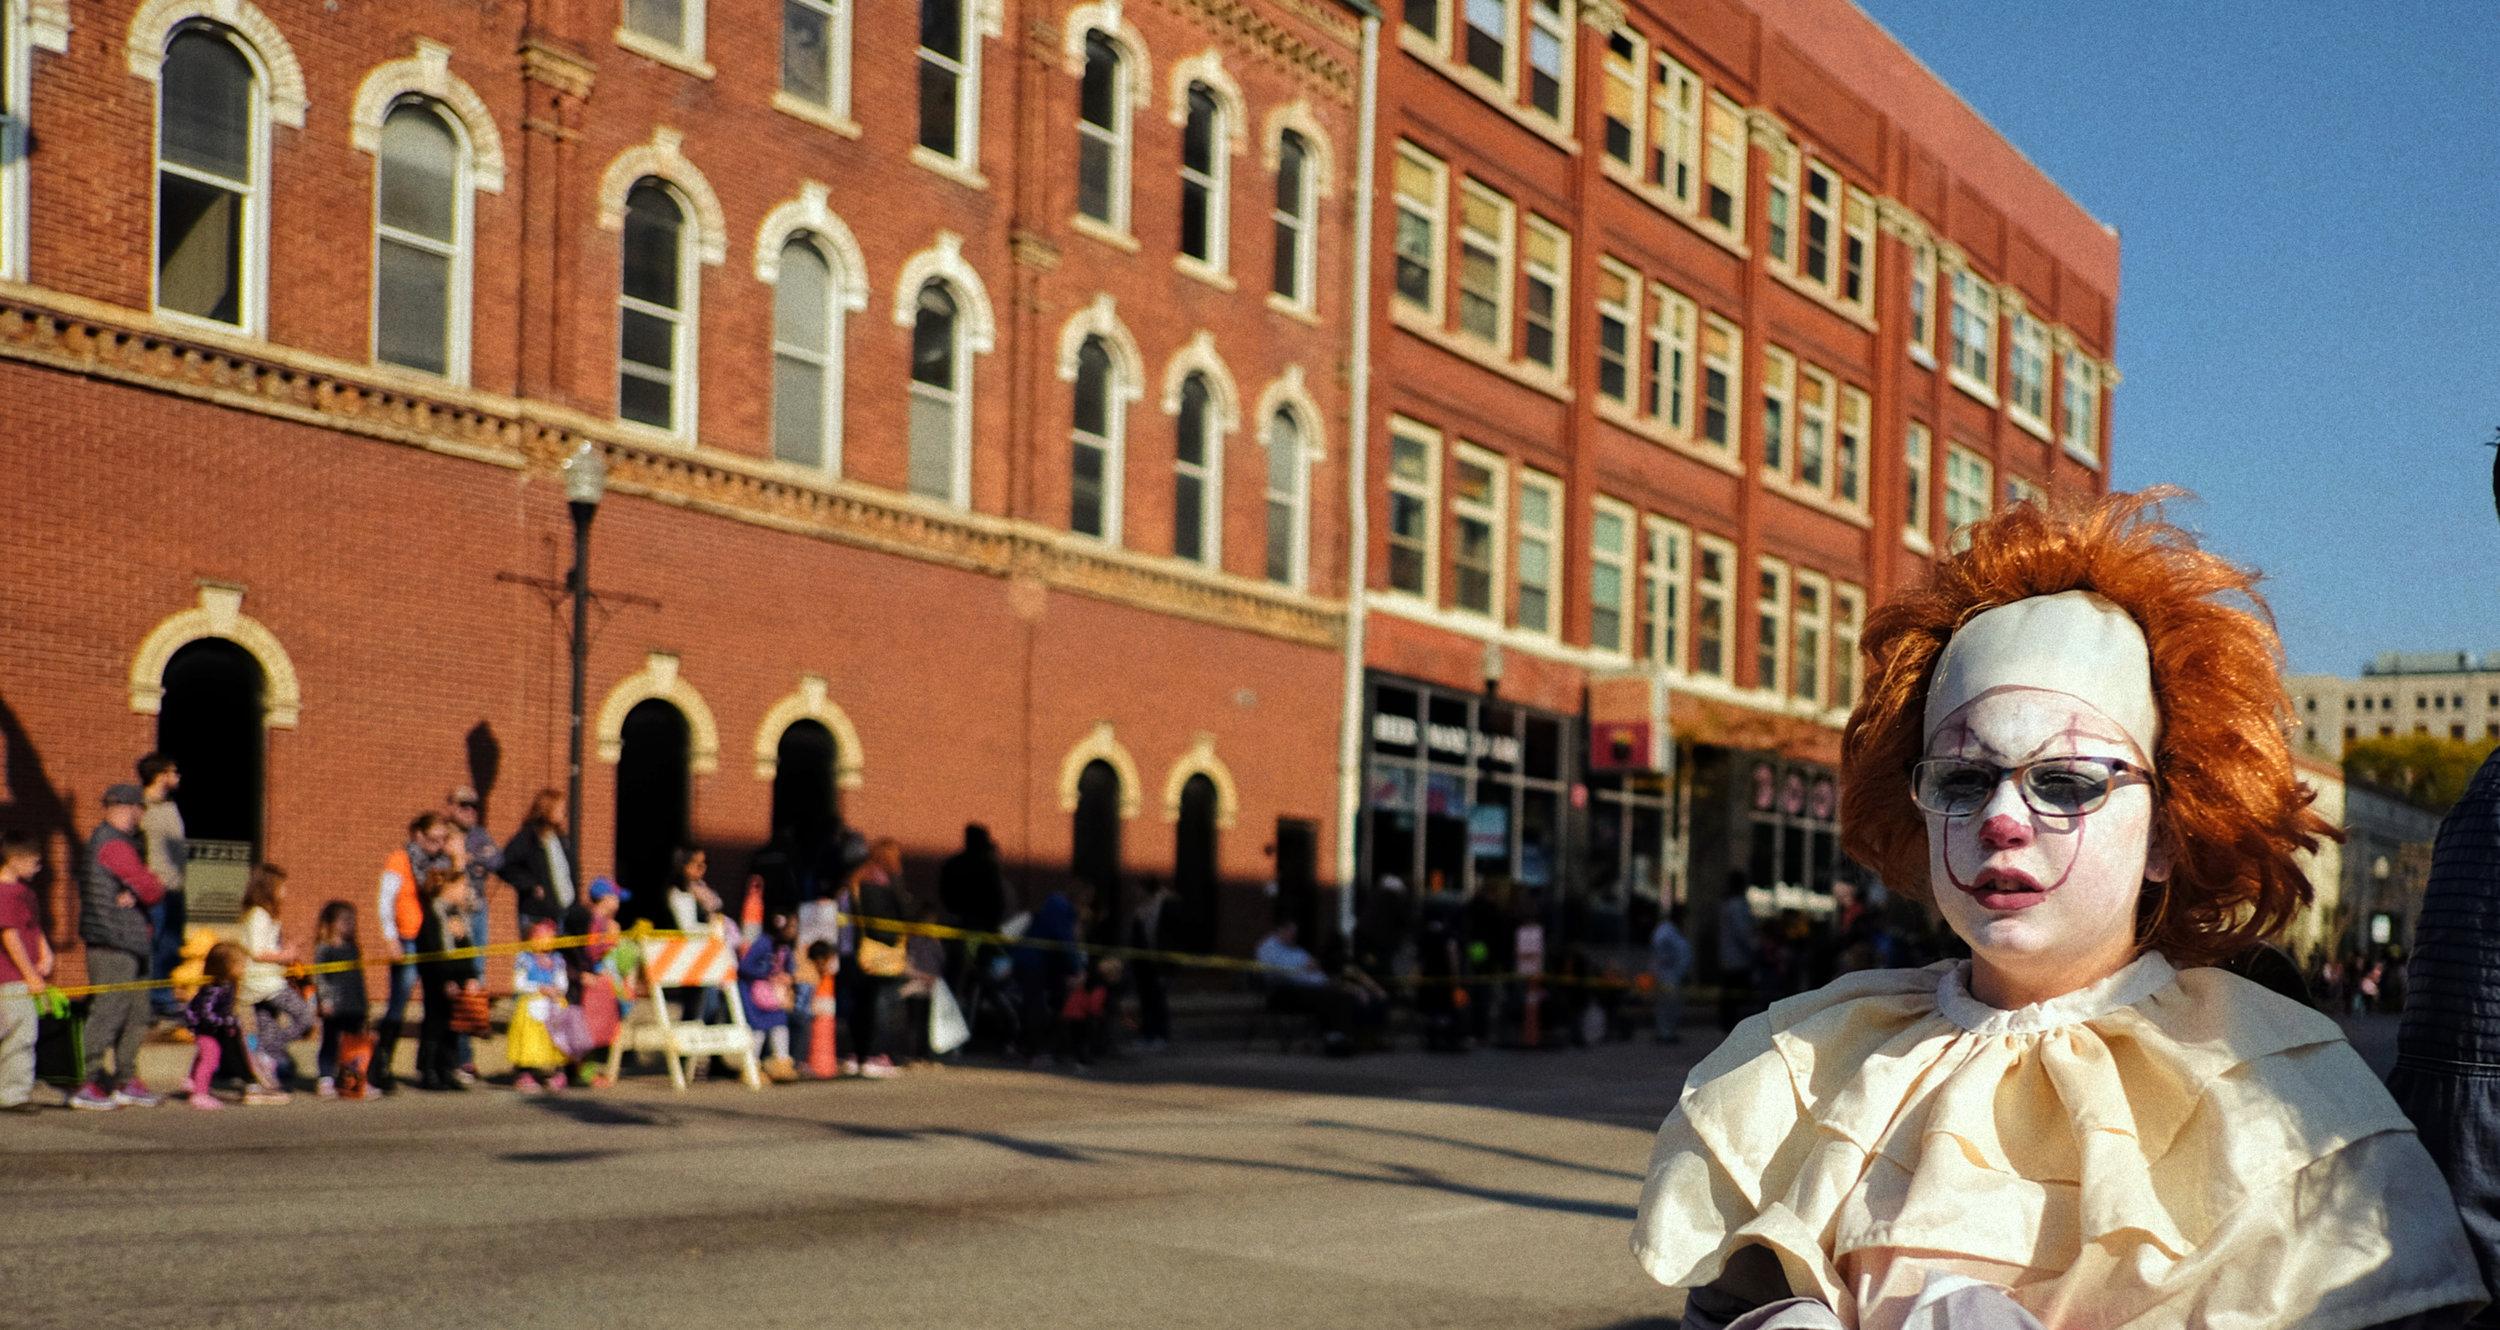 Old kid in Davenport, Iowa